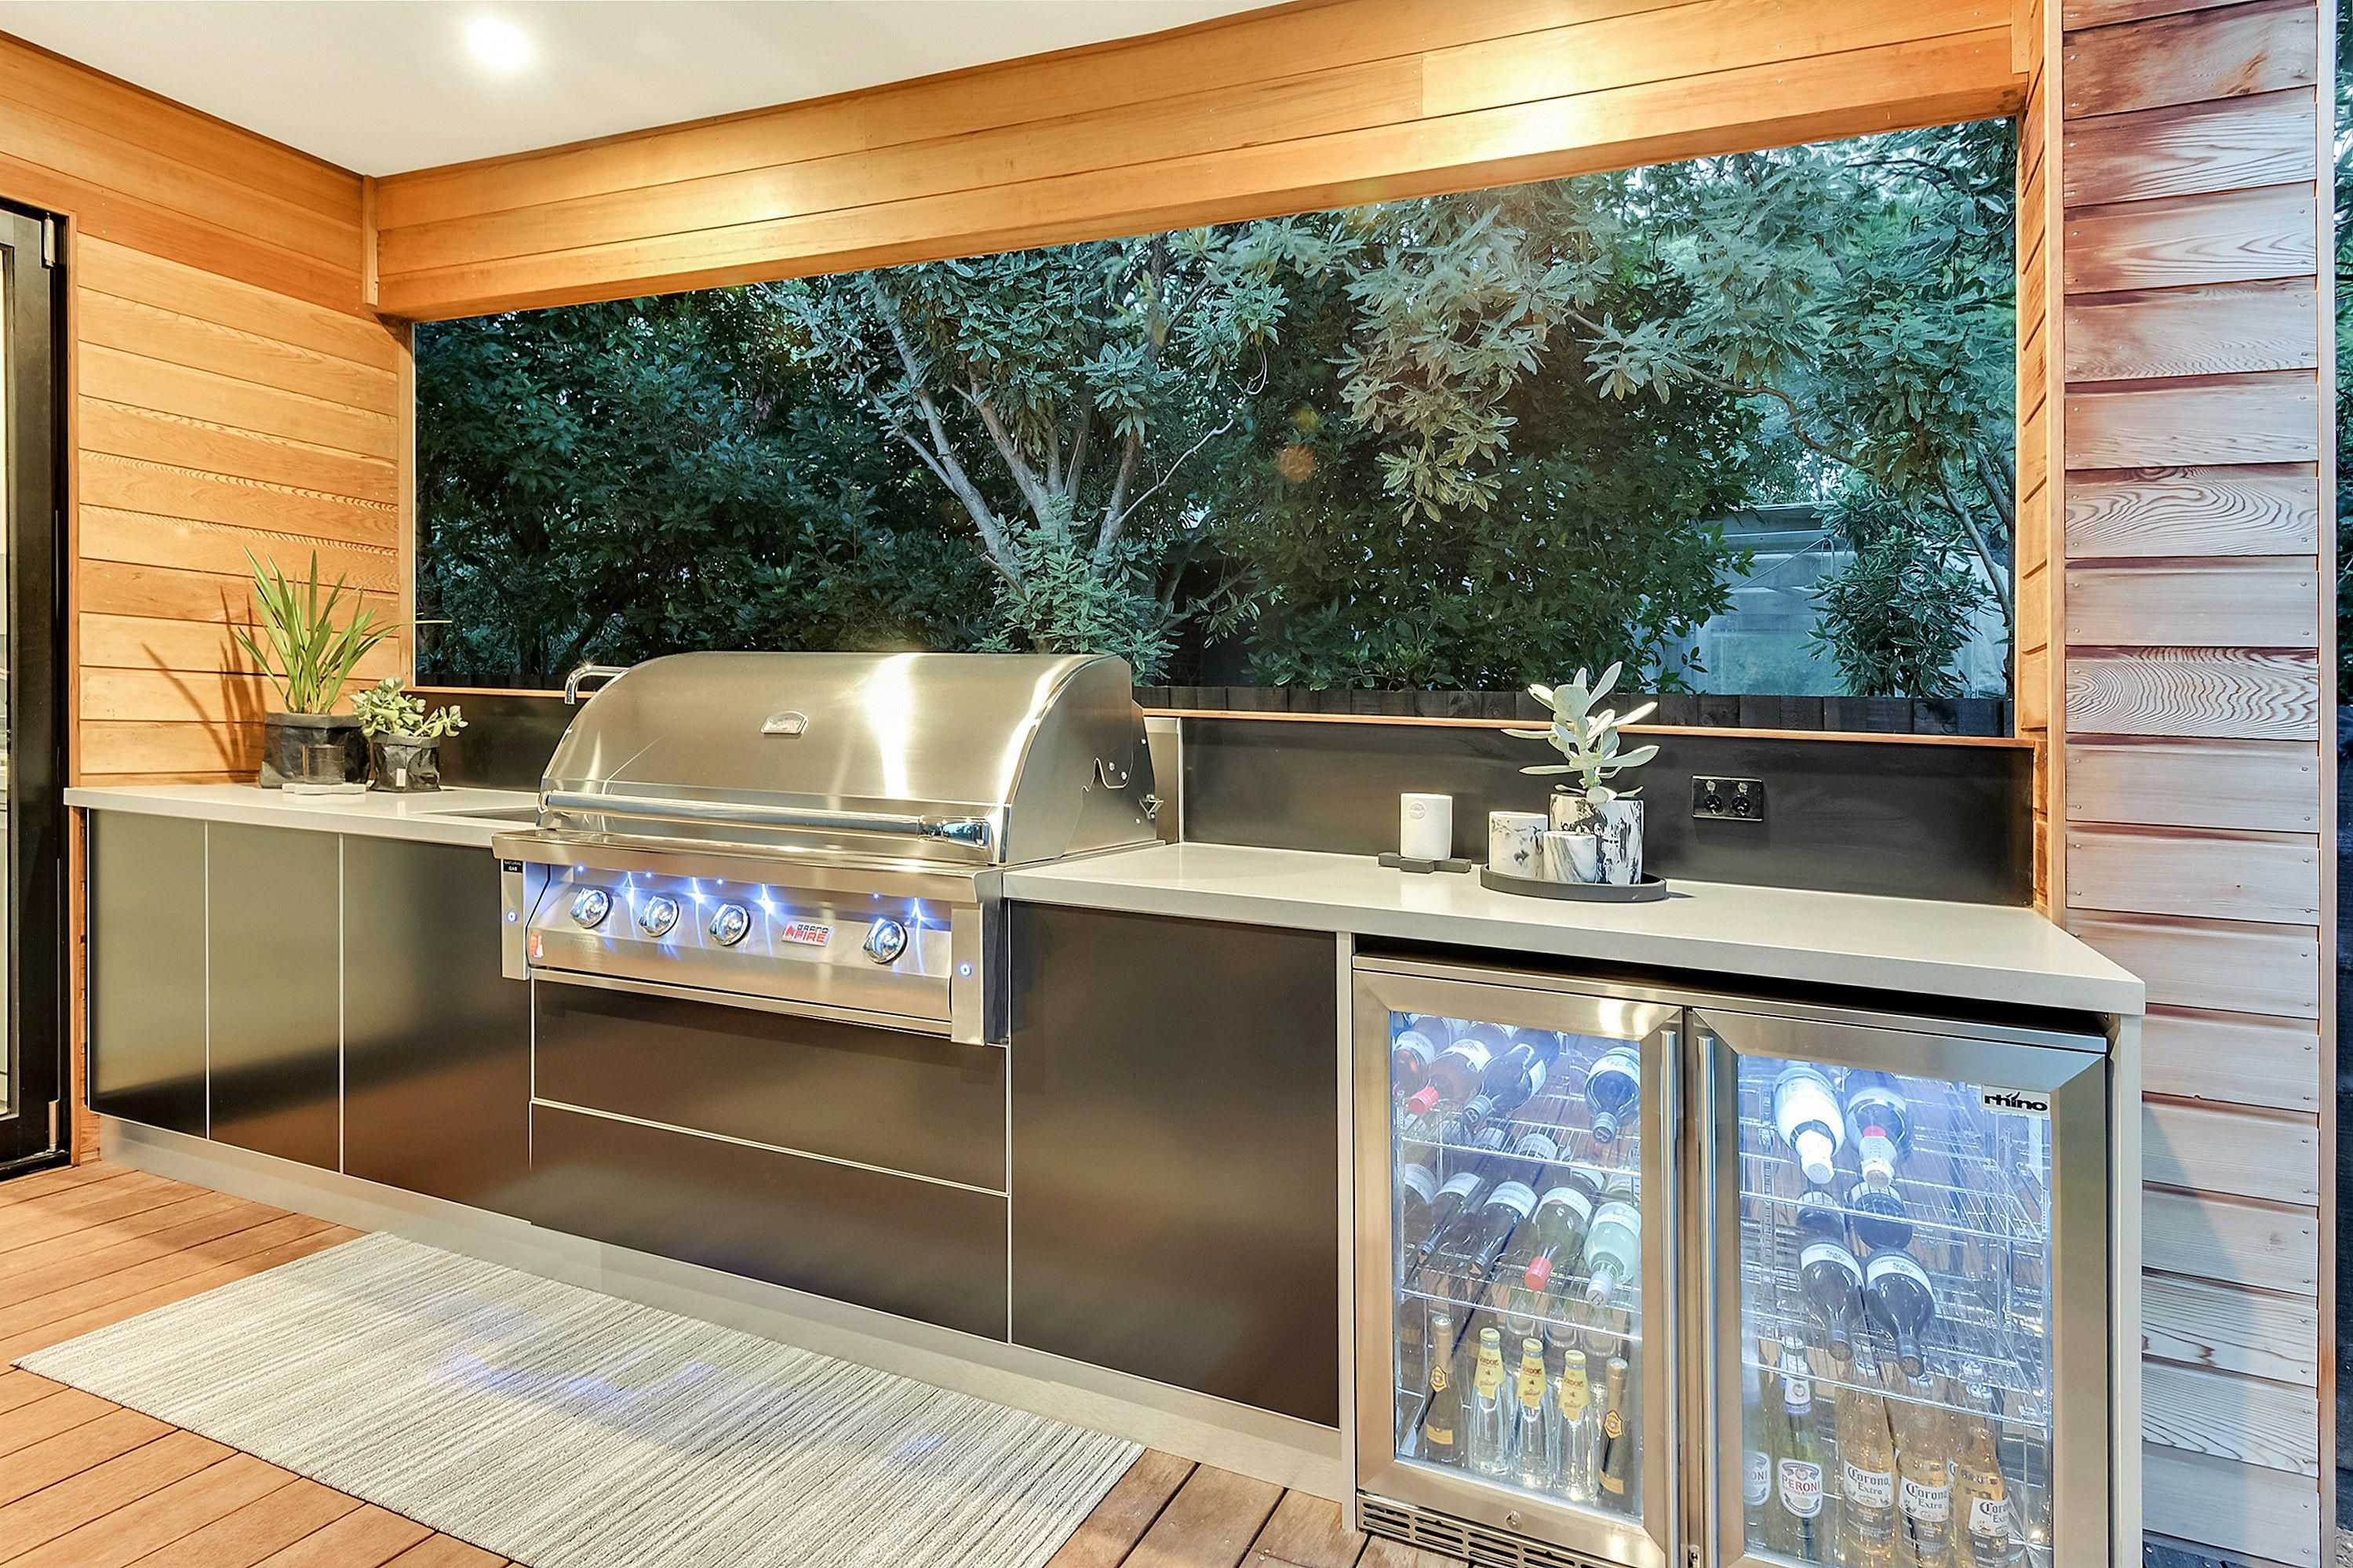 Alfresco Kitchens Limetree Alfresco Outdoor Kitchens Outdoor Bbq Kitchen Outdoor Kitchen Design Outdoor Kitchen Cabinets